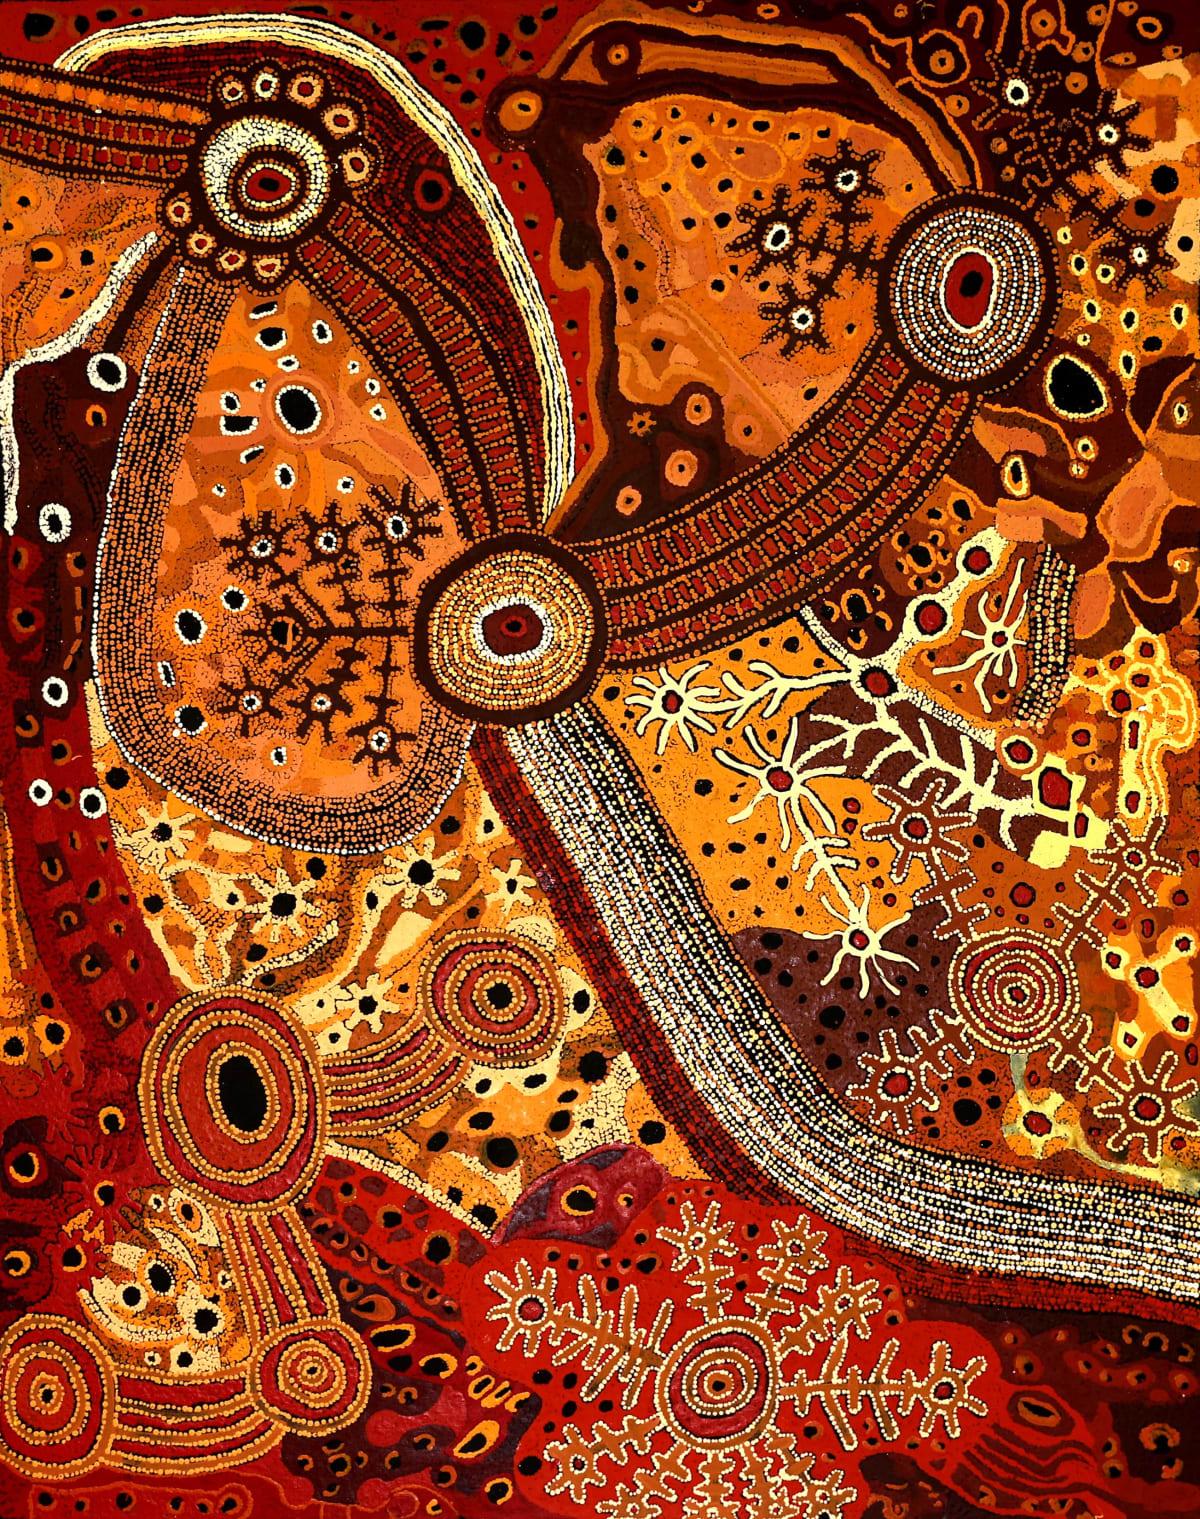 Pauline Minmila Wangin Kapi Tjukula (waterhole), 2019 Acrylic on linen 152 x 122 cm